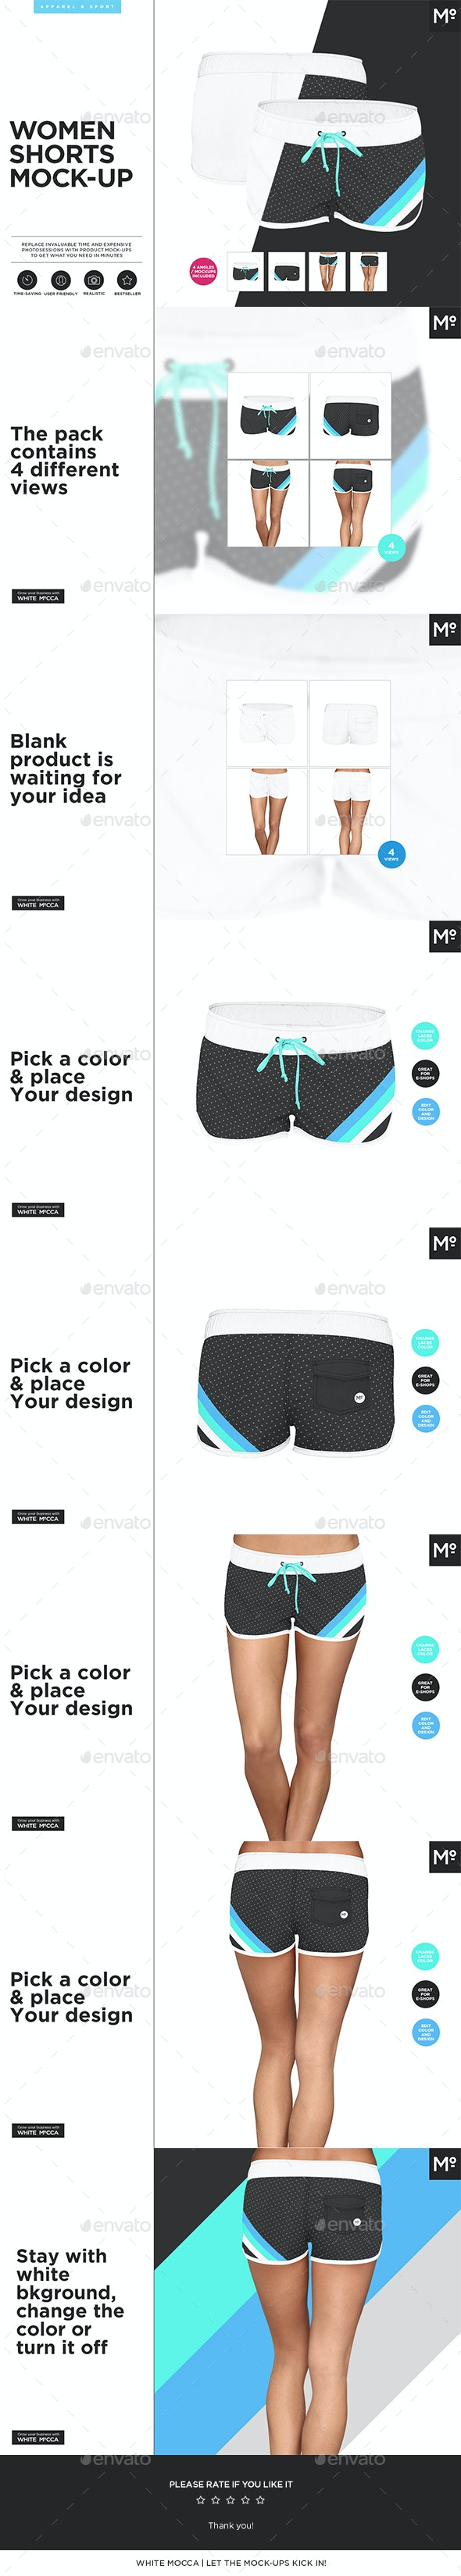 Women Shorts Mock-up - Miscellaneous Apparel